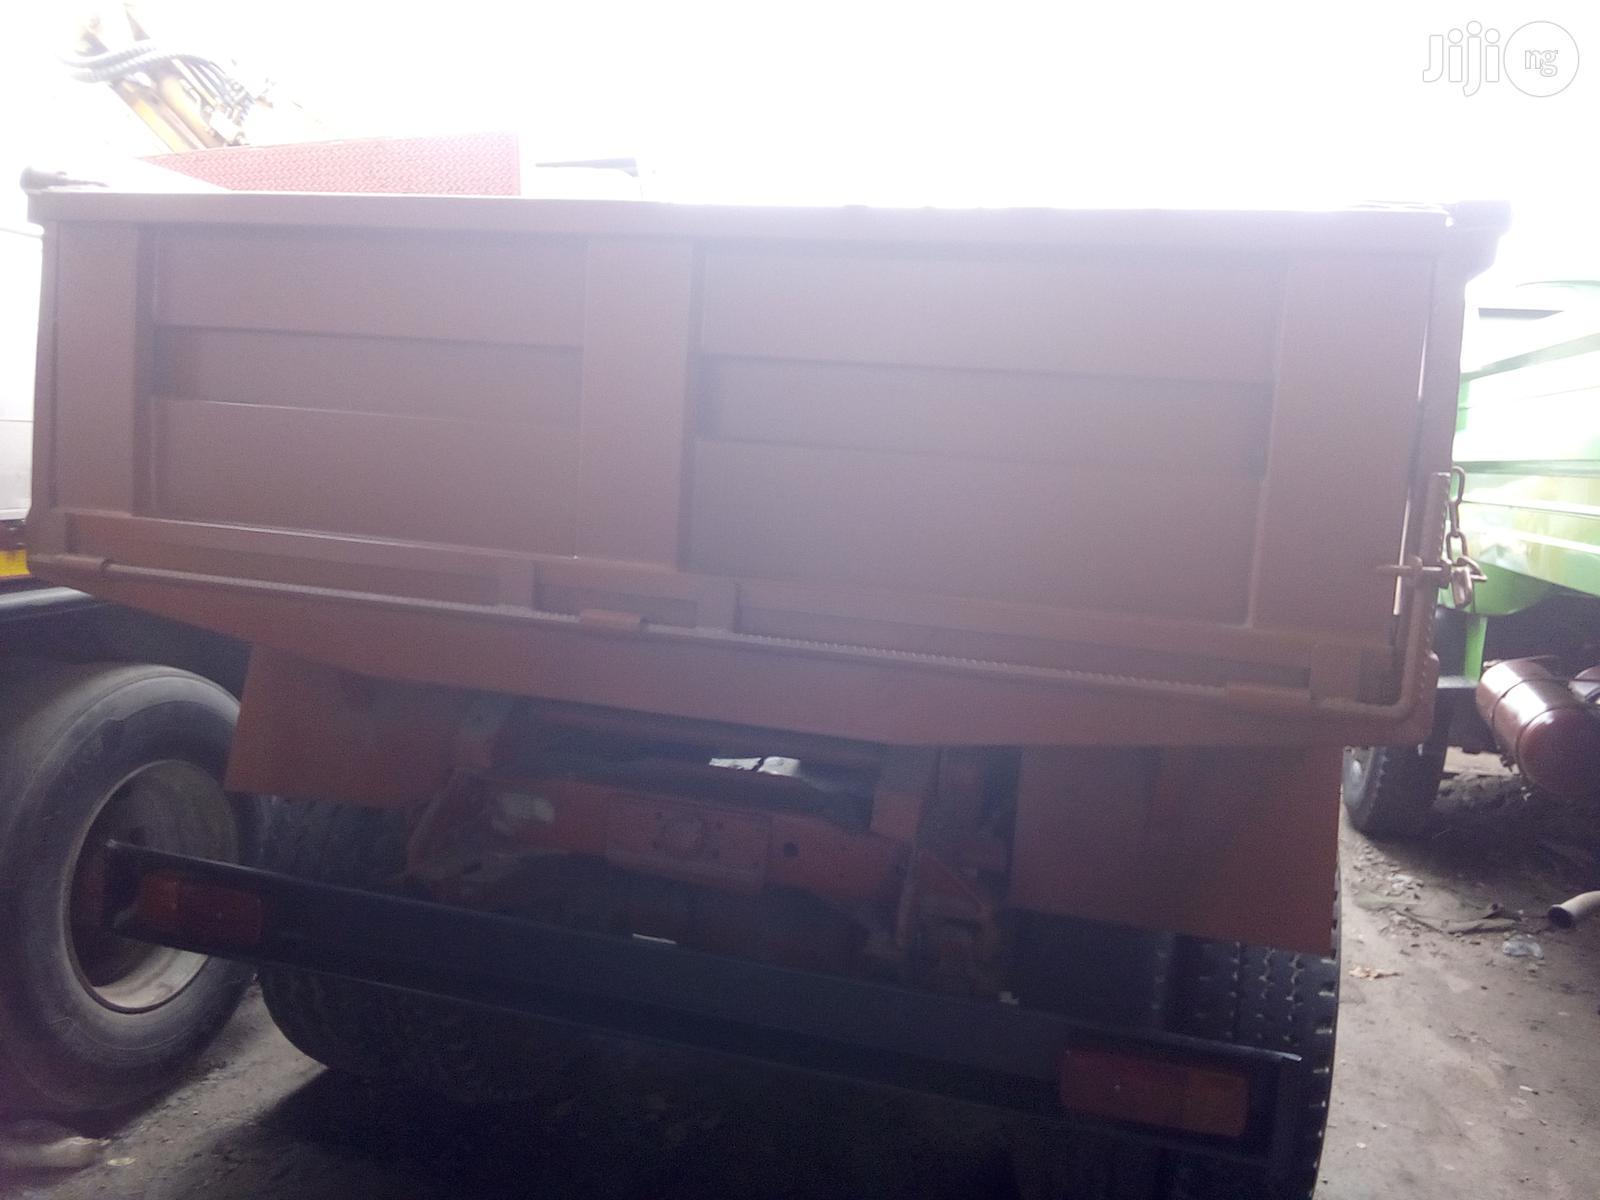 Mercedes Benz 911 1993 Orange Tipper Tokunbo   Trucks & Trailers for sale in Apapa, Lagos State, Nigeria